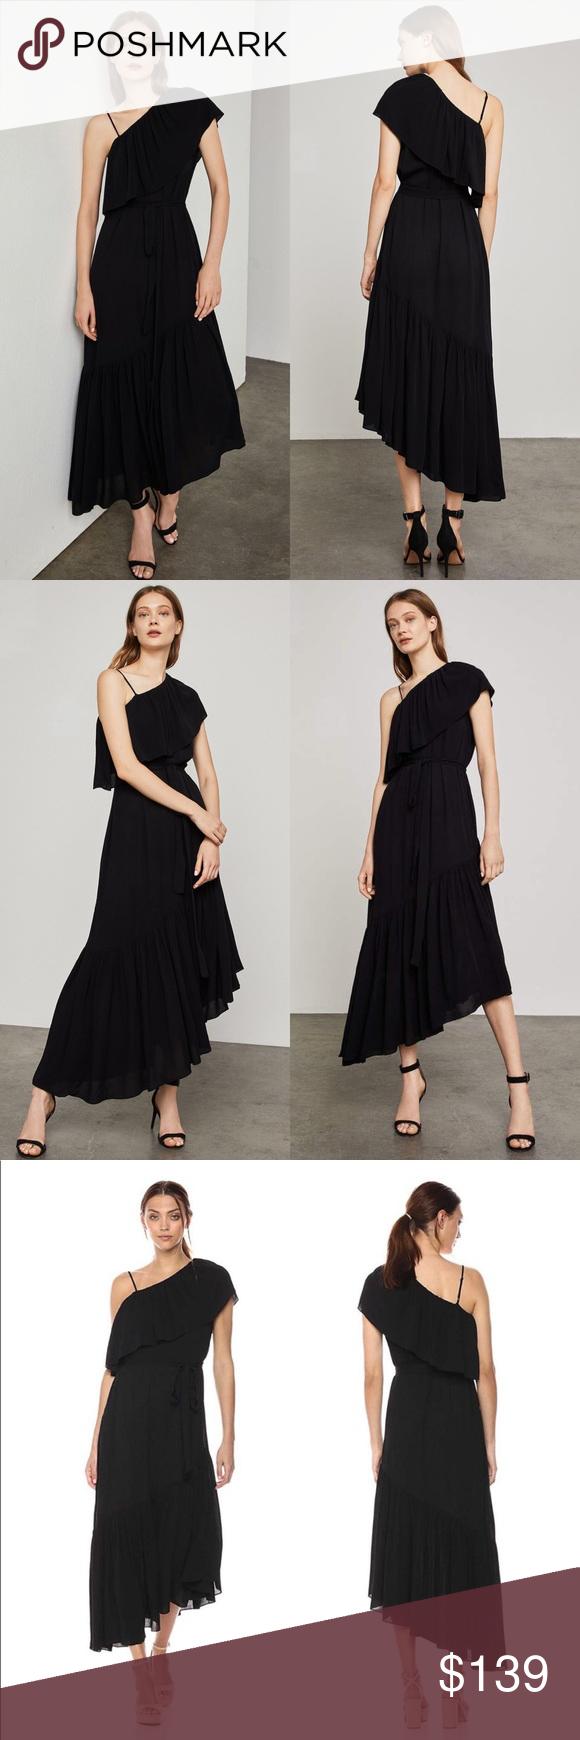 28++ Bcbg ruffle maxi dress ideas in 2021